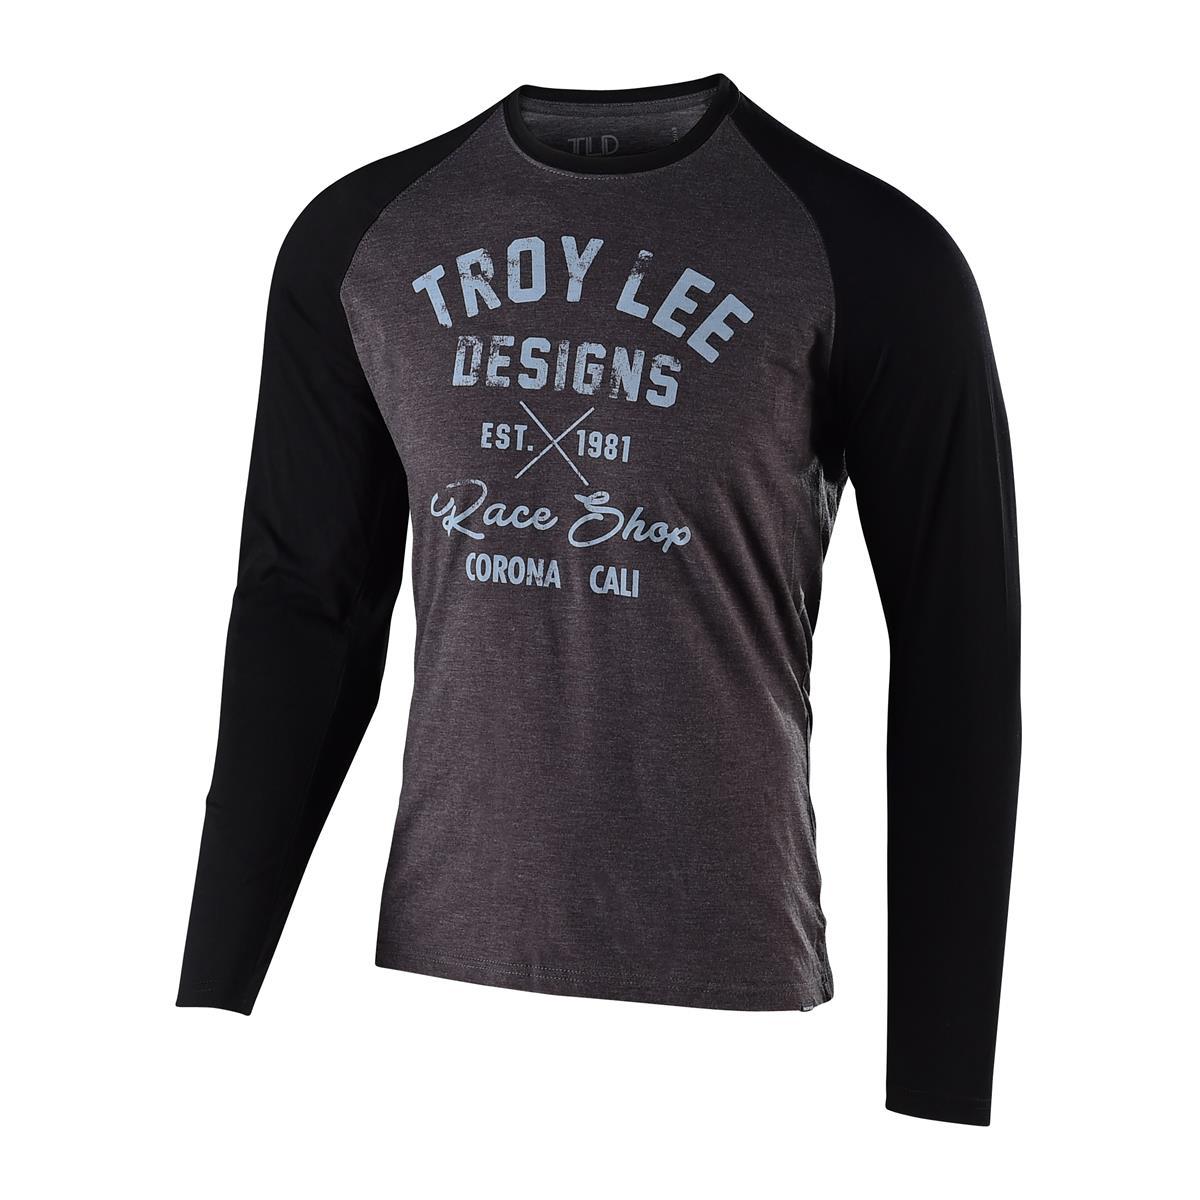 Troy Lee Designs Langarmshirt Vintage Race Shop Charcoal/Schwarz